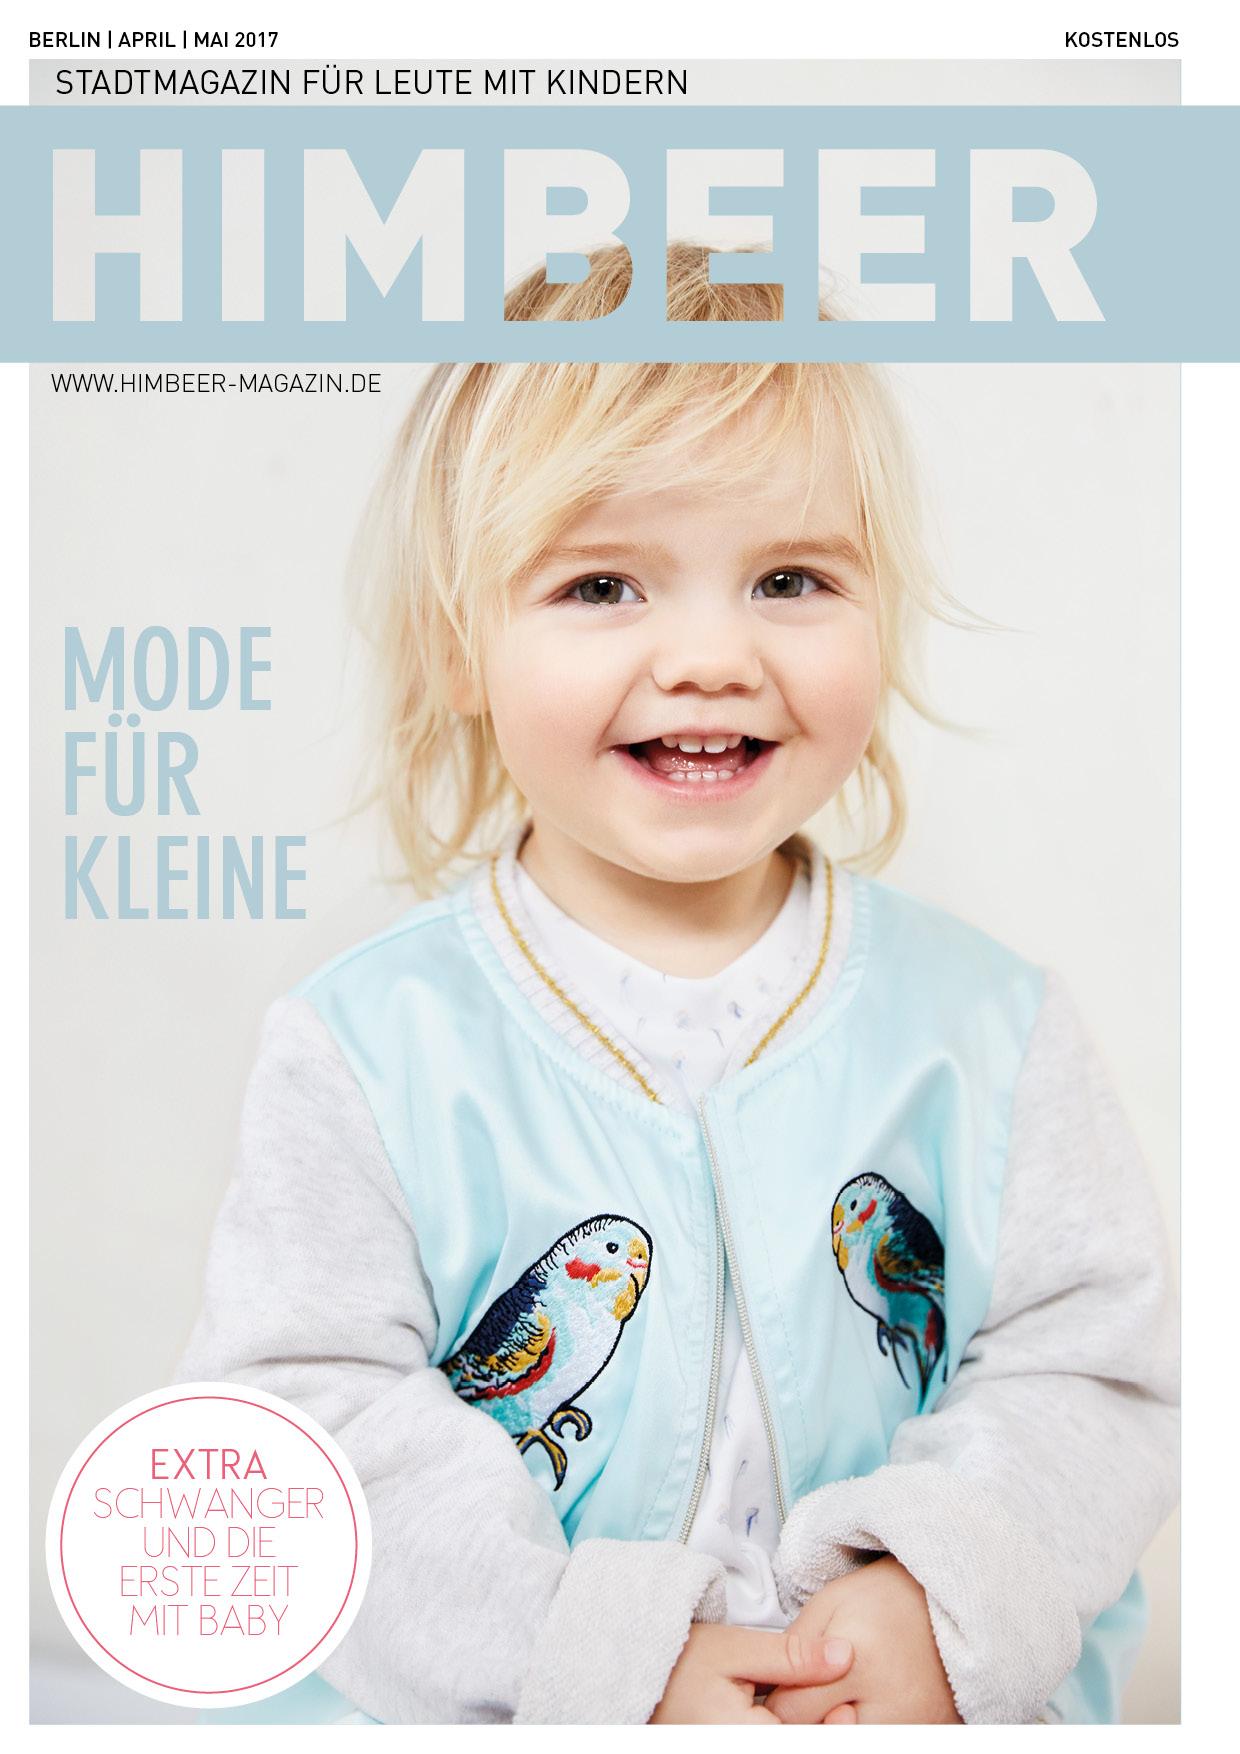 HIMBEER-Heft-APR-MAI-2017-Titel